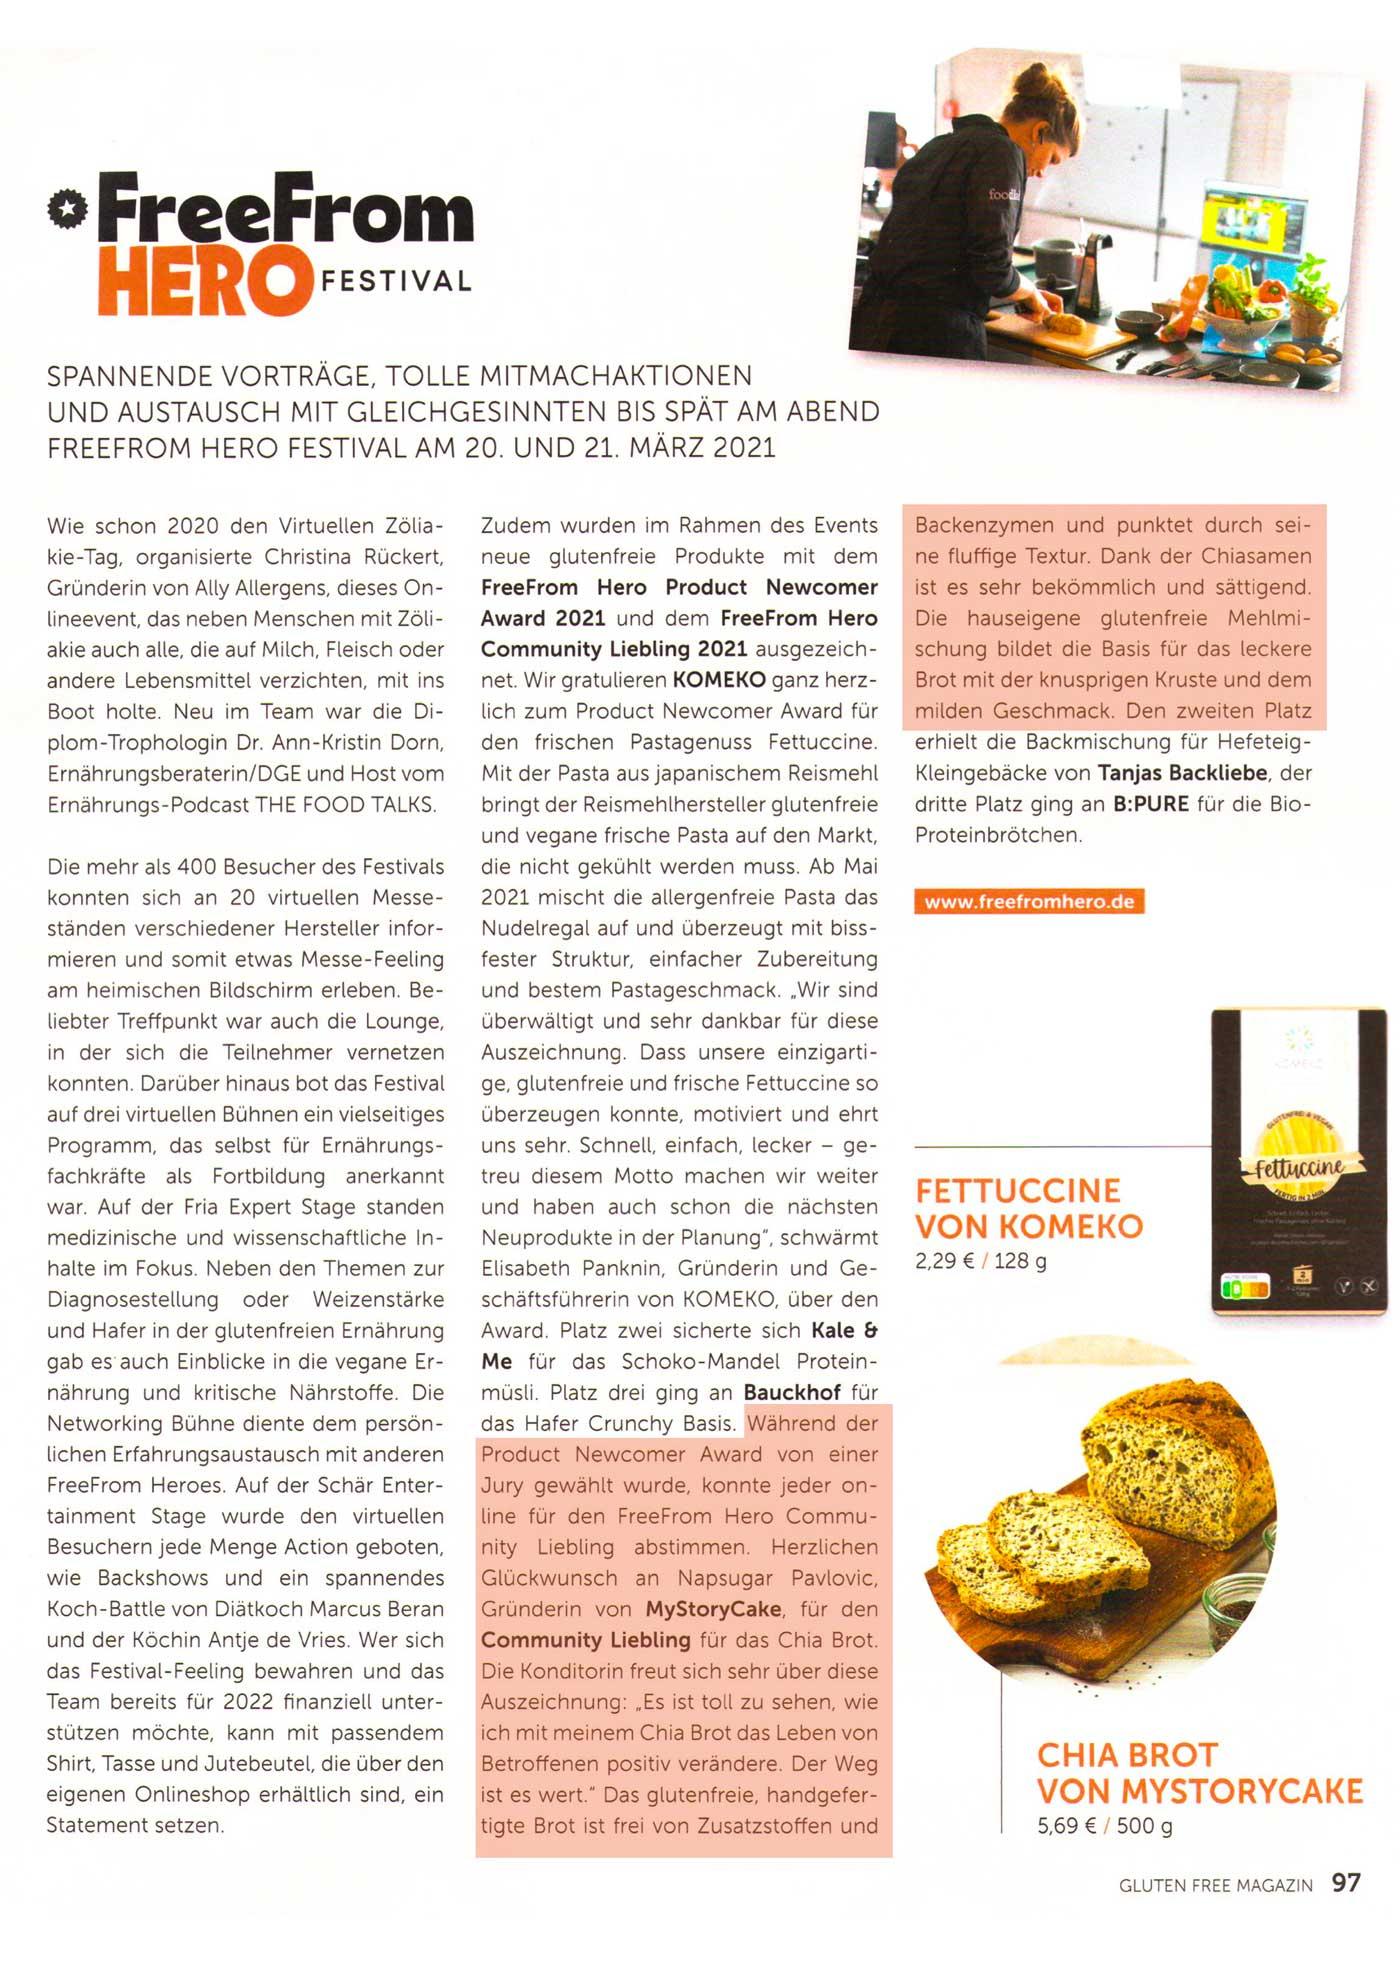 Gluten-Free-Magazin-Bericht-MyStoryCake